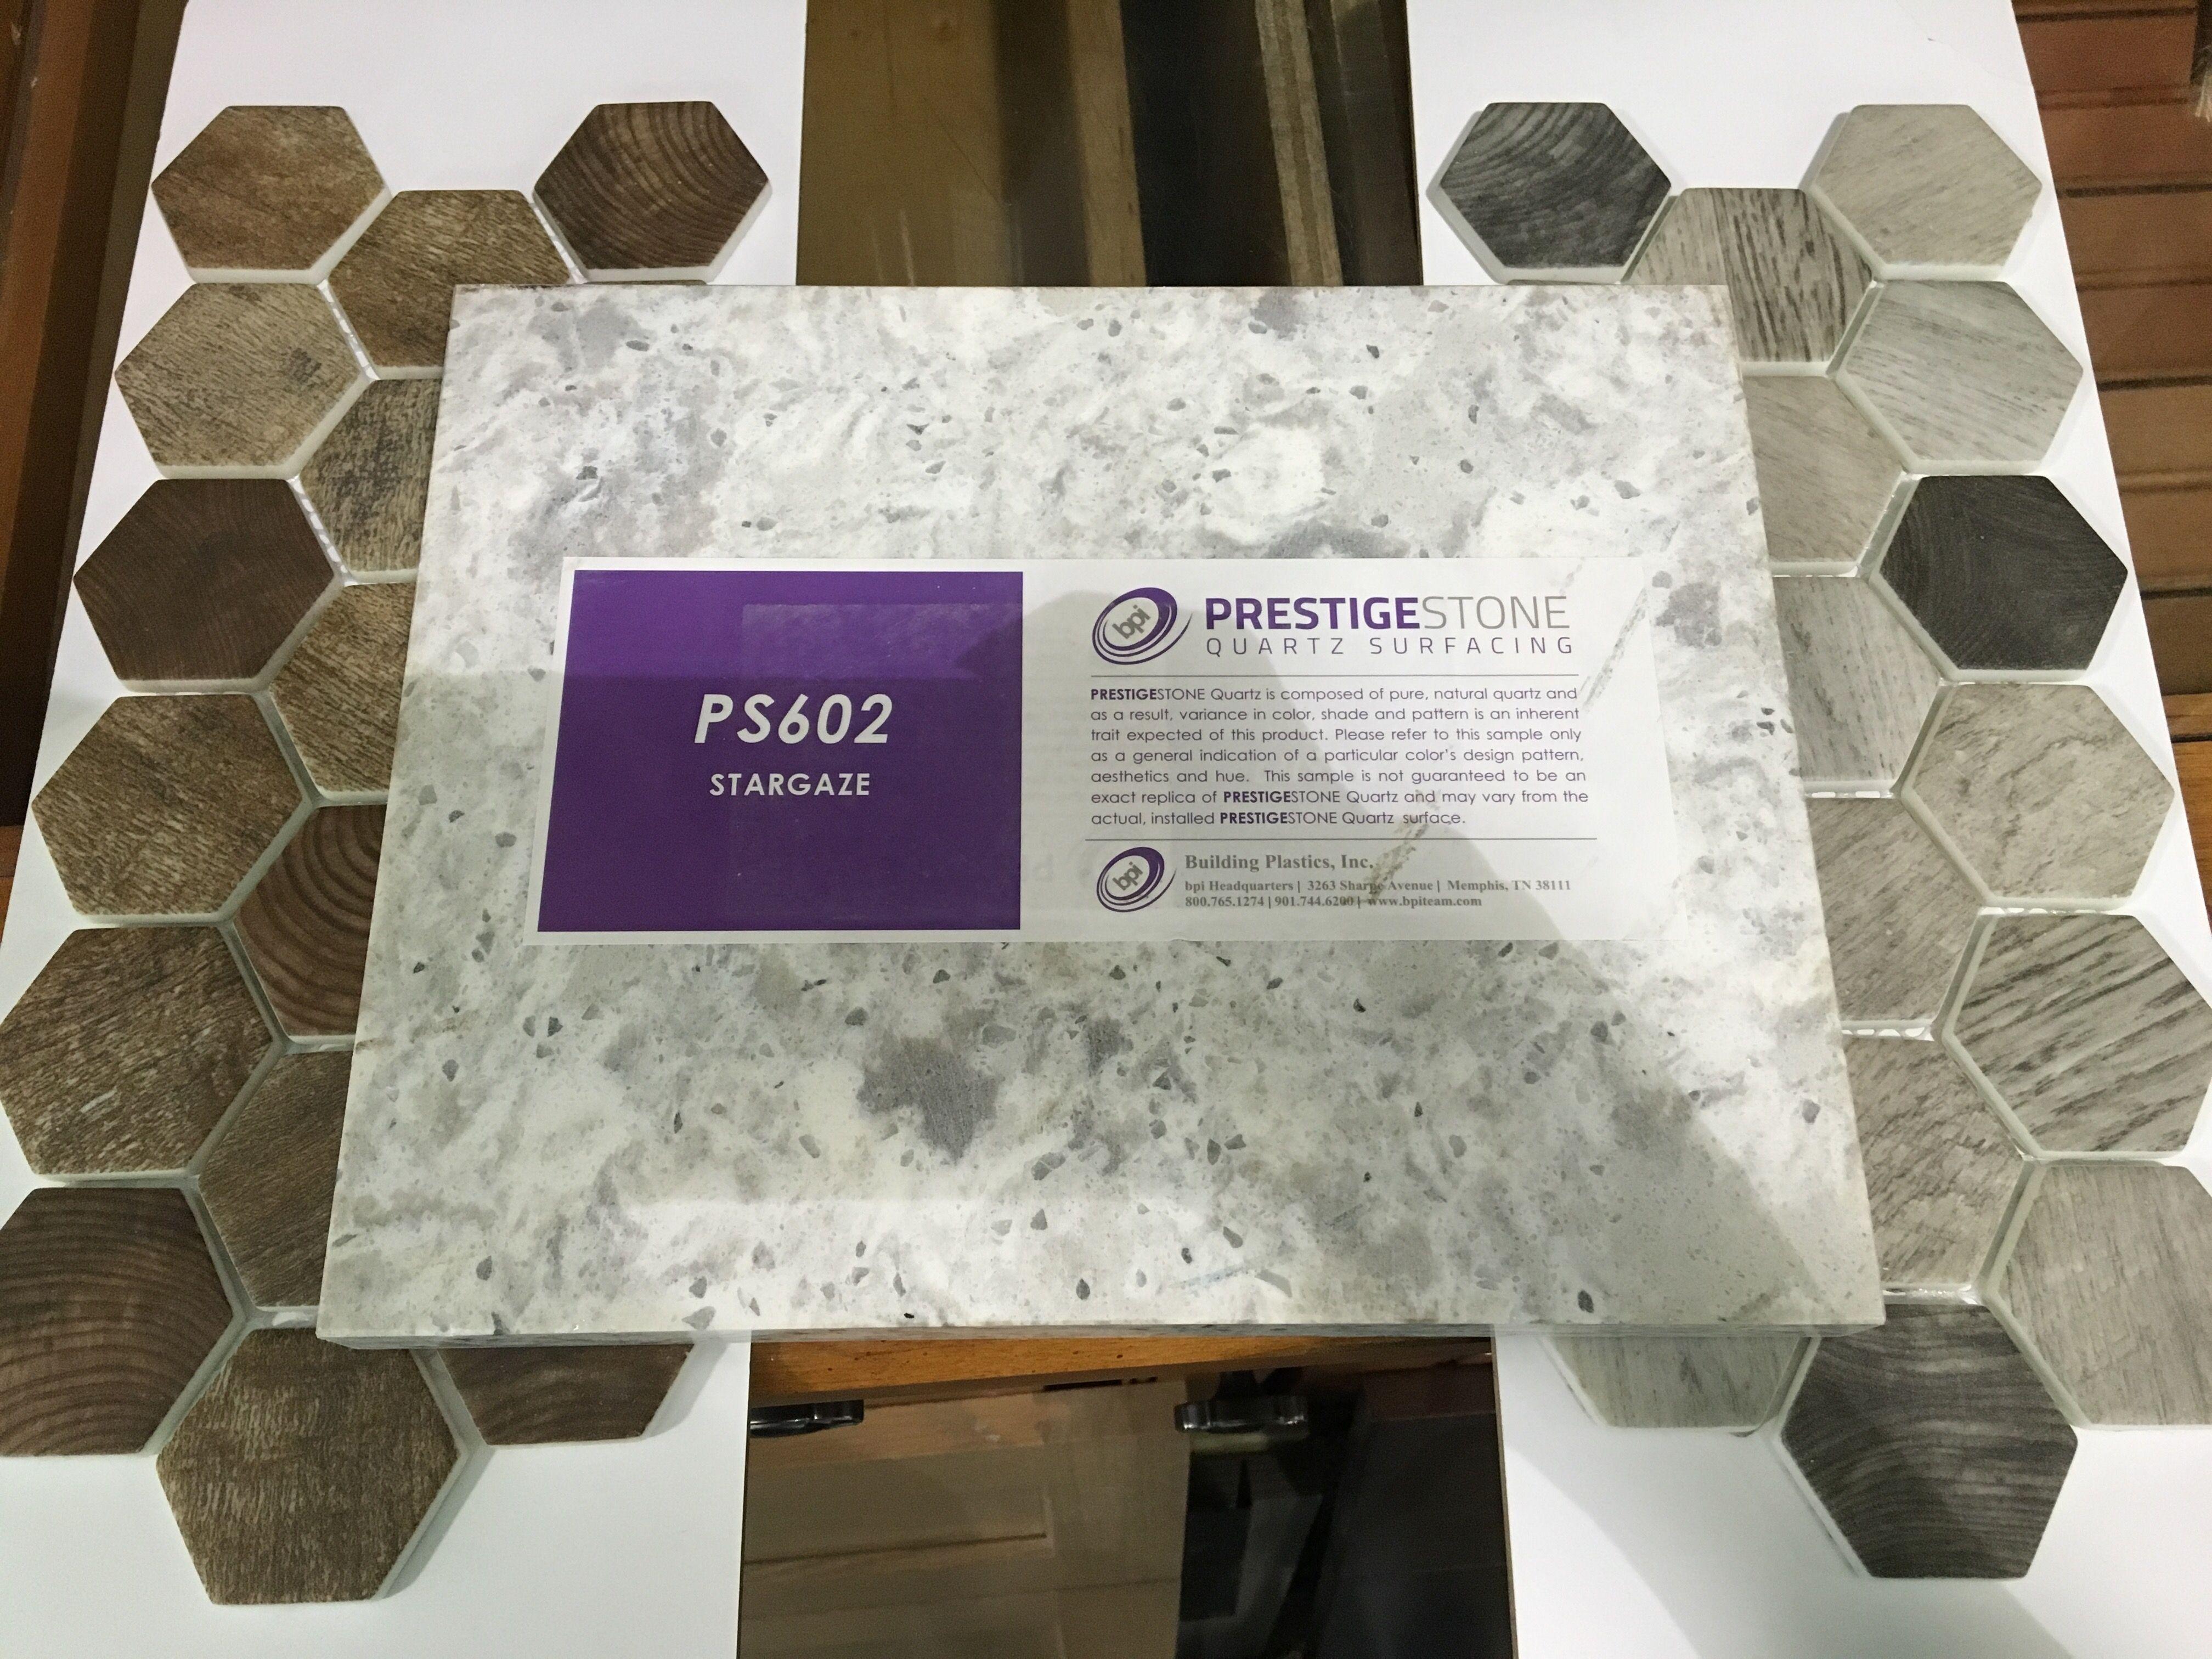 Pin By Called To Order On Client Trip 471 Quartz Surfacing Quartz Stone Stargazing